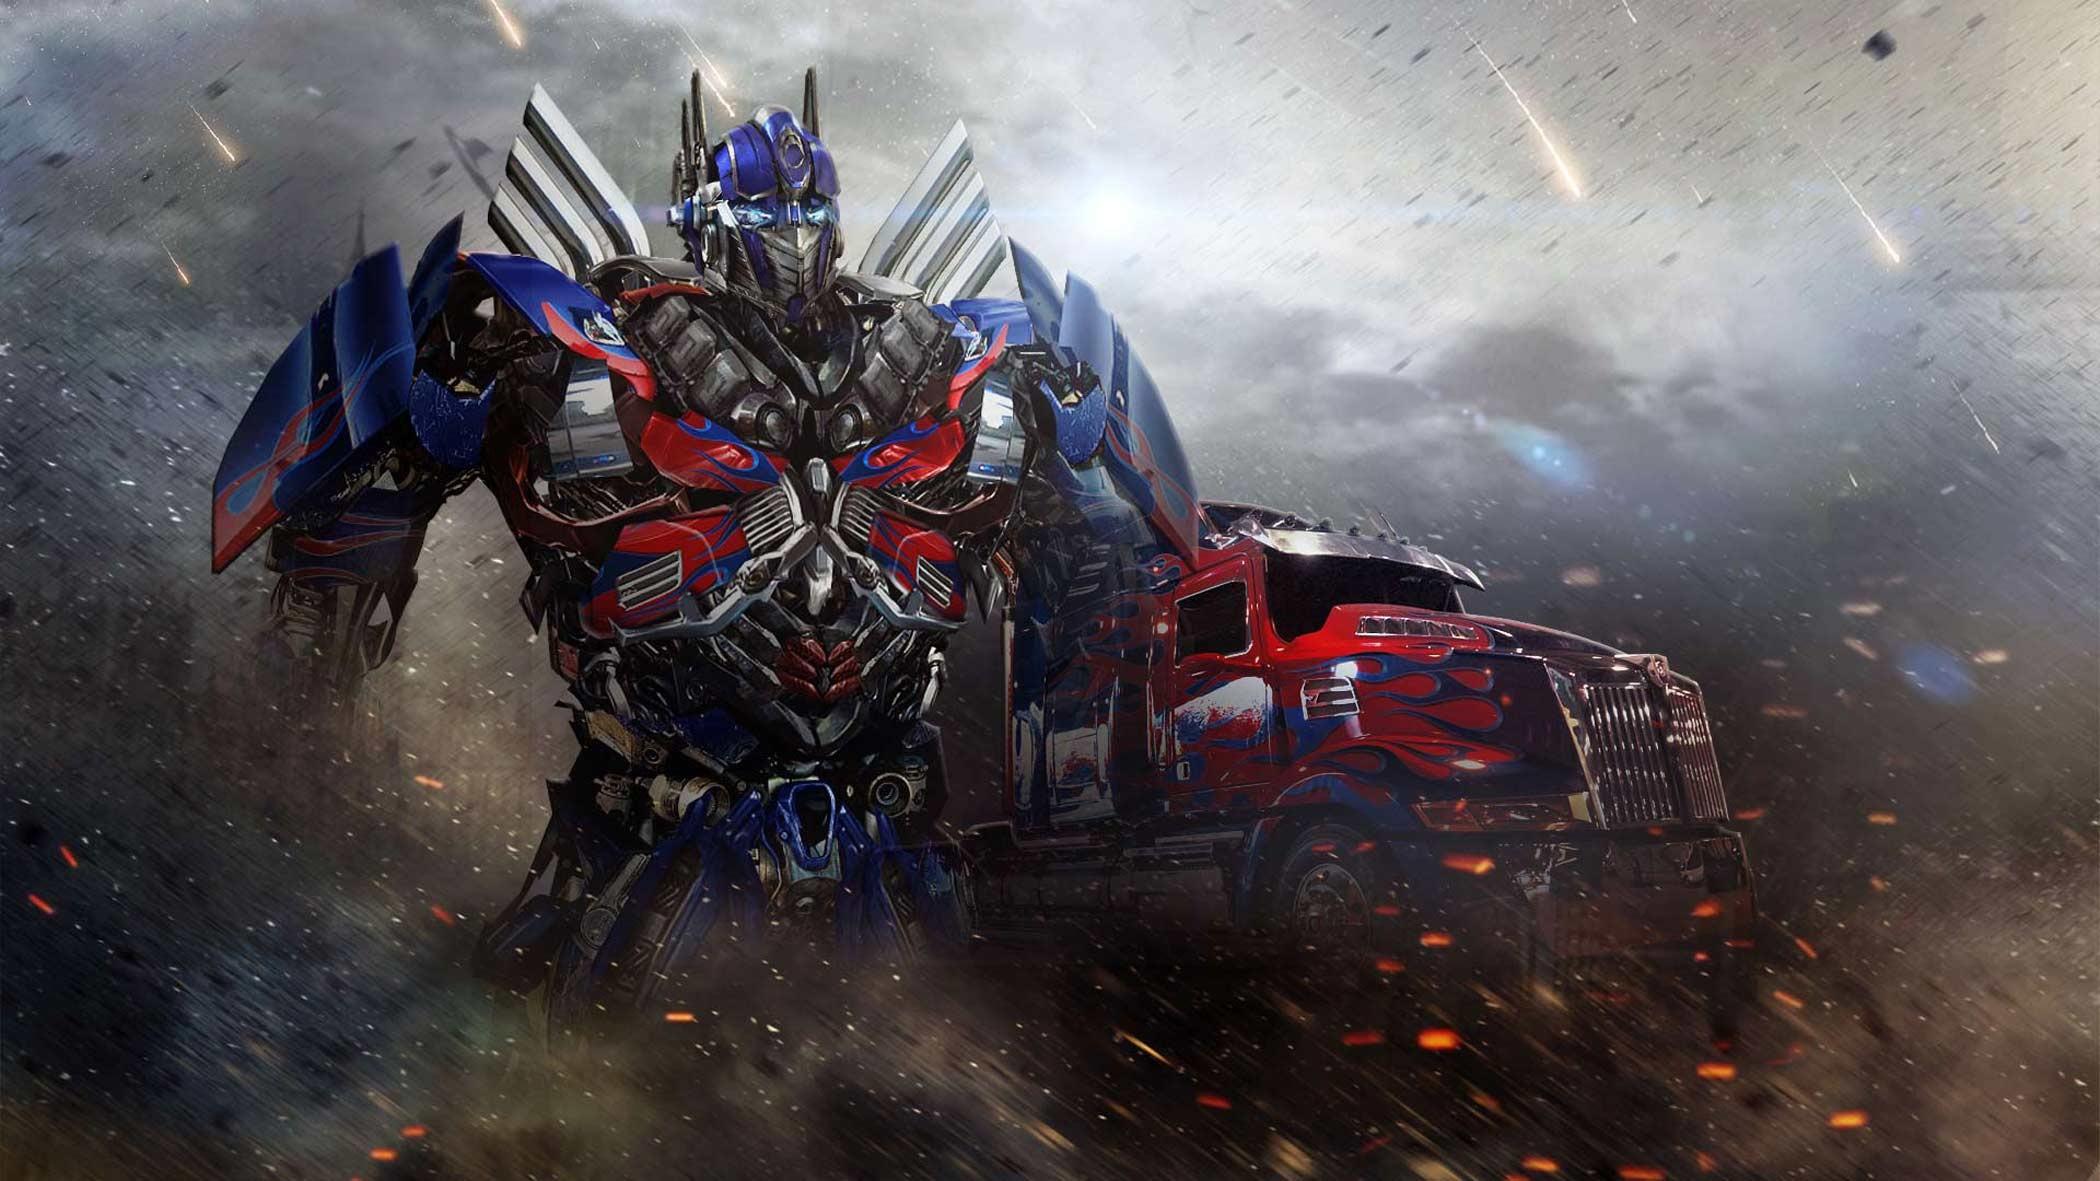 Optimus Prime Toy Age of Extinction – wallpaper.